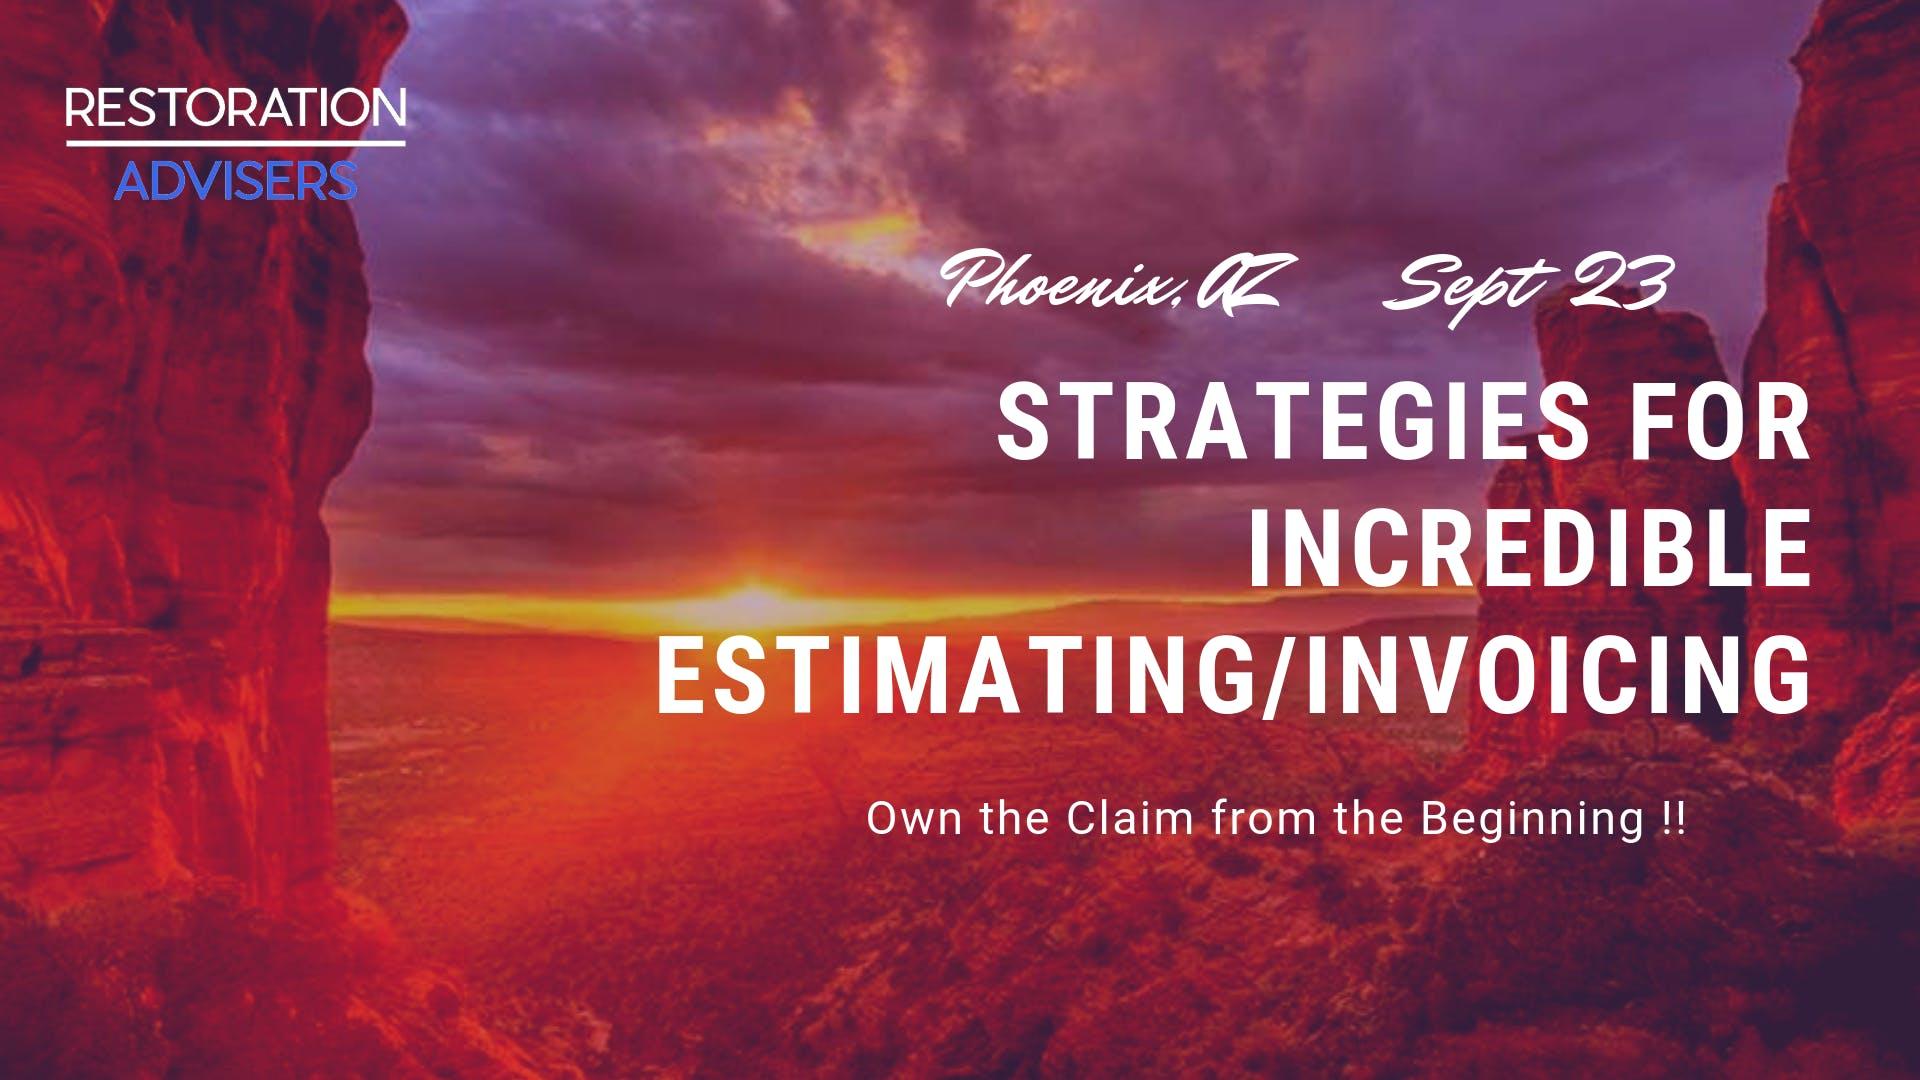 Restoration 2.0 Series: Customer Centric Estimating & Invoicing- Phoenix